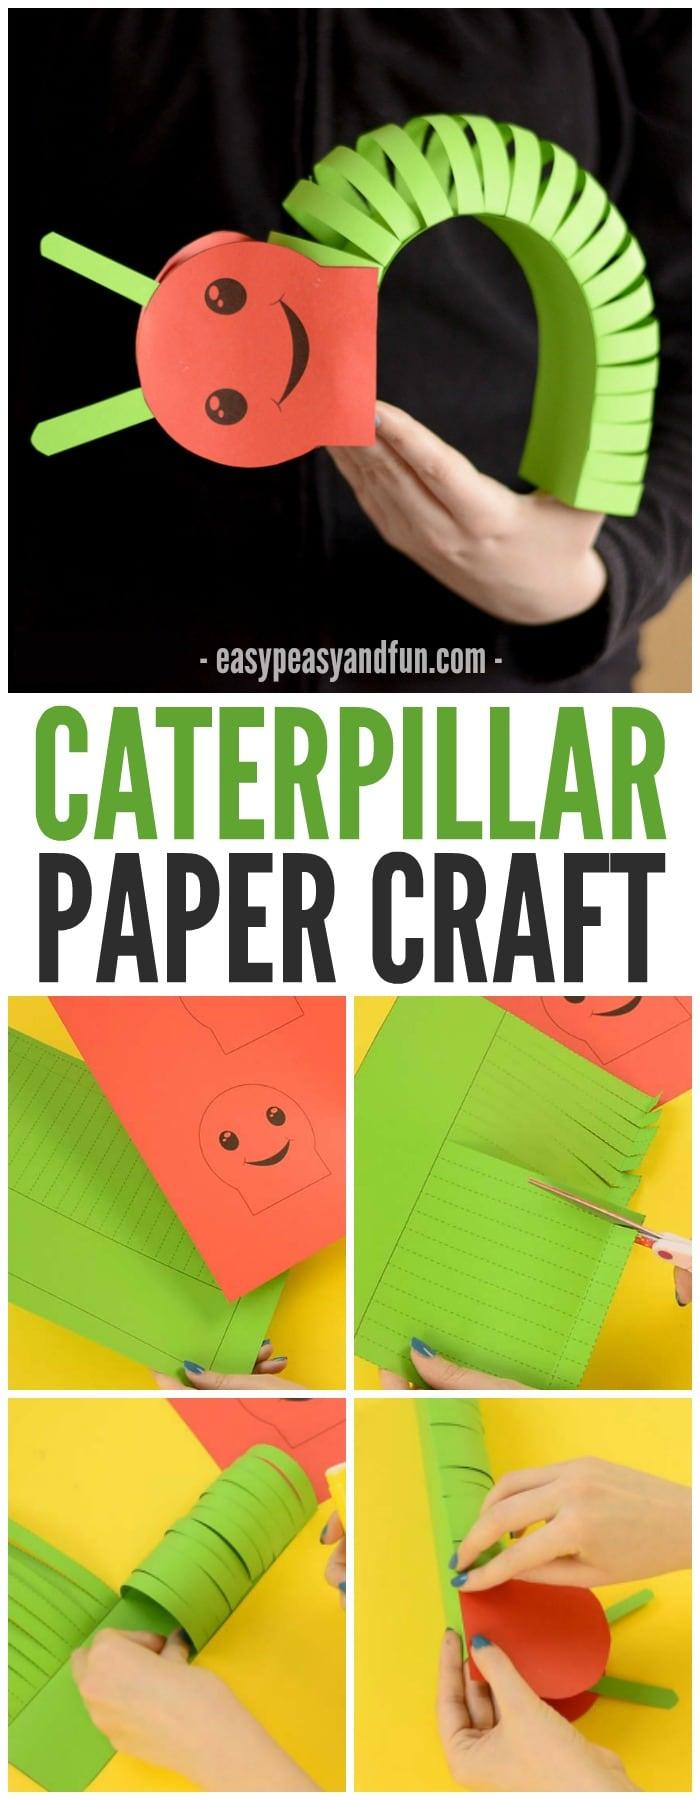 Cute Printable 3D Caterpillar Paper Craft for Kids